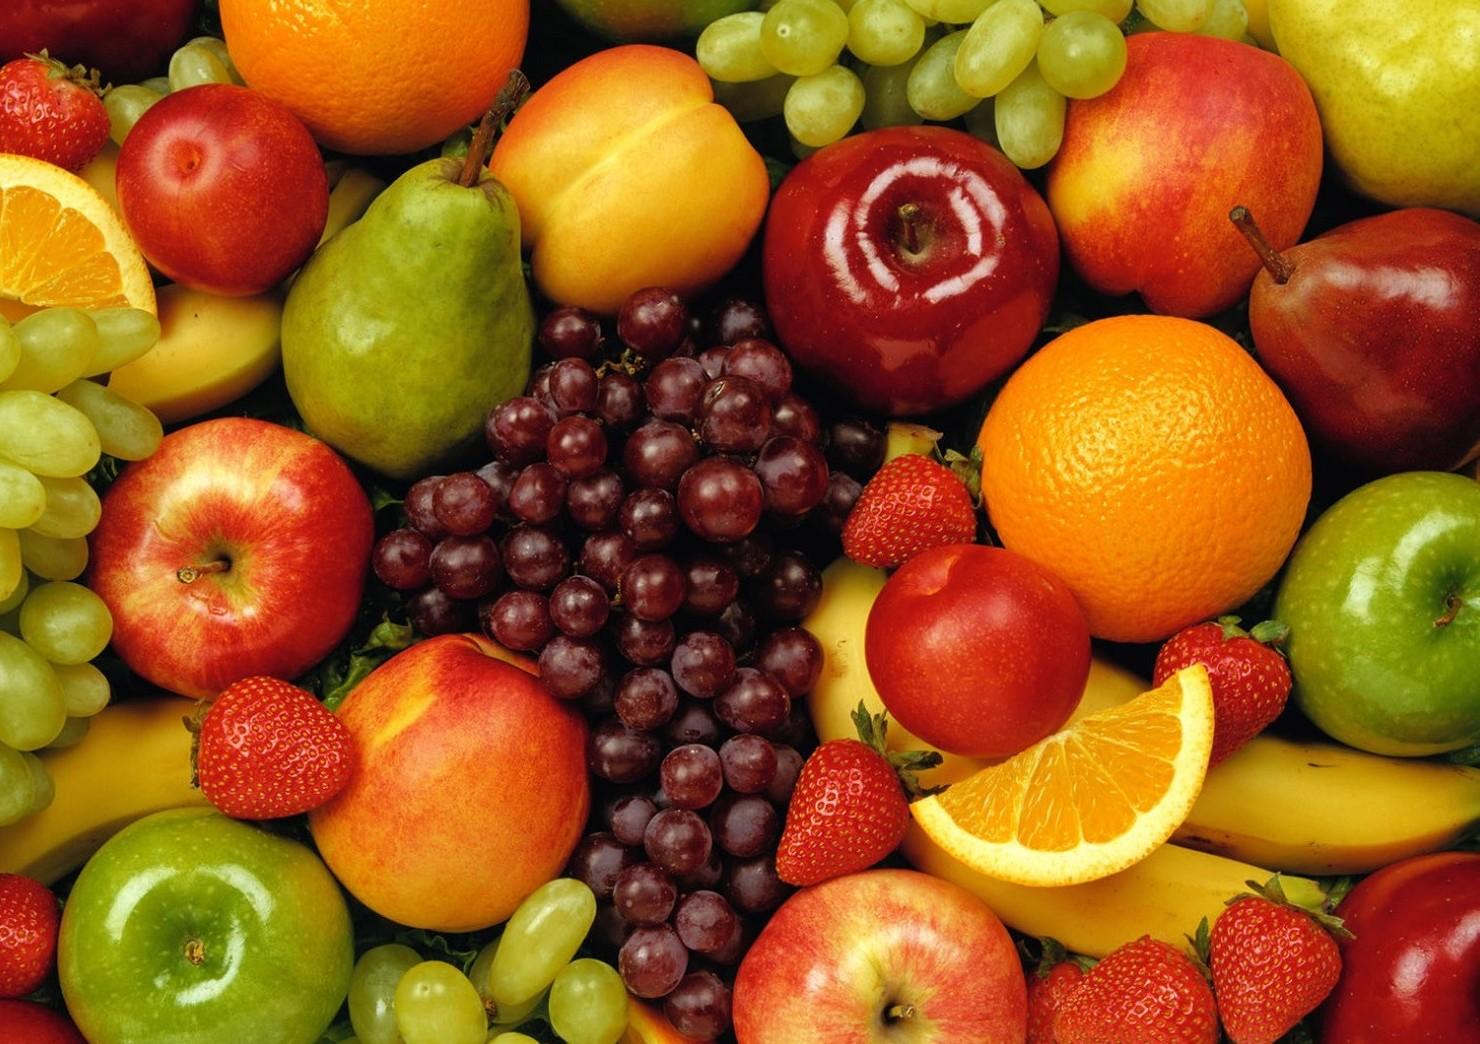 Verdura e frutta fresca tutta o quasi co